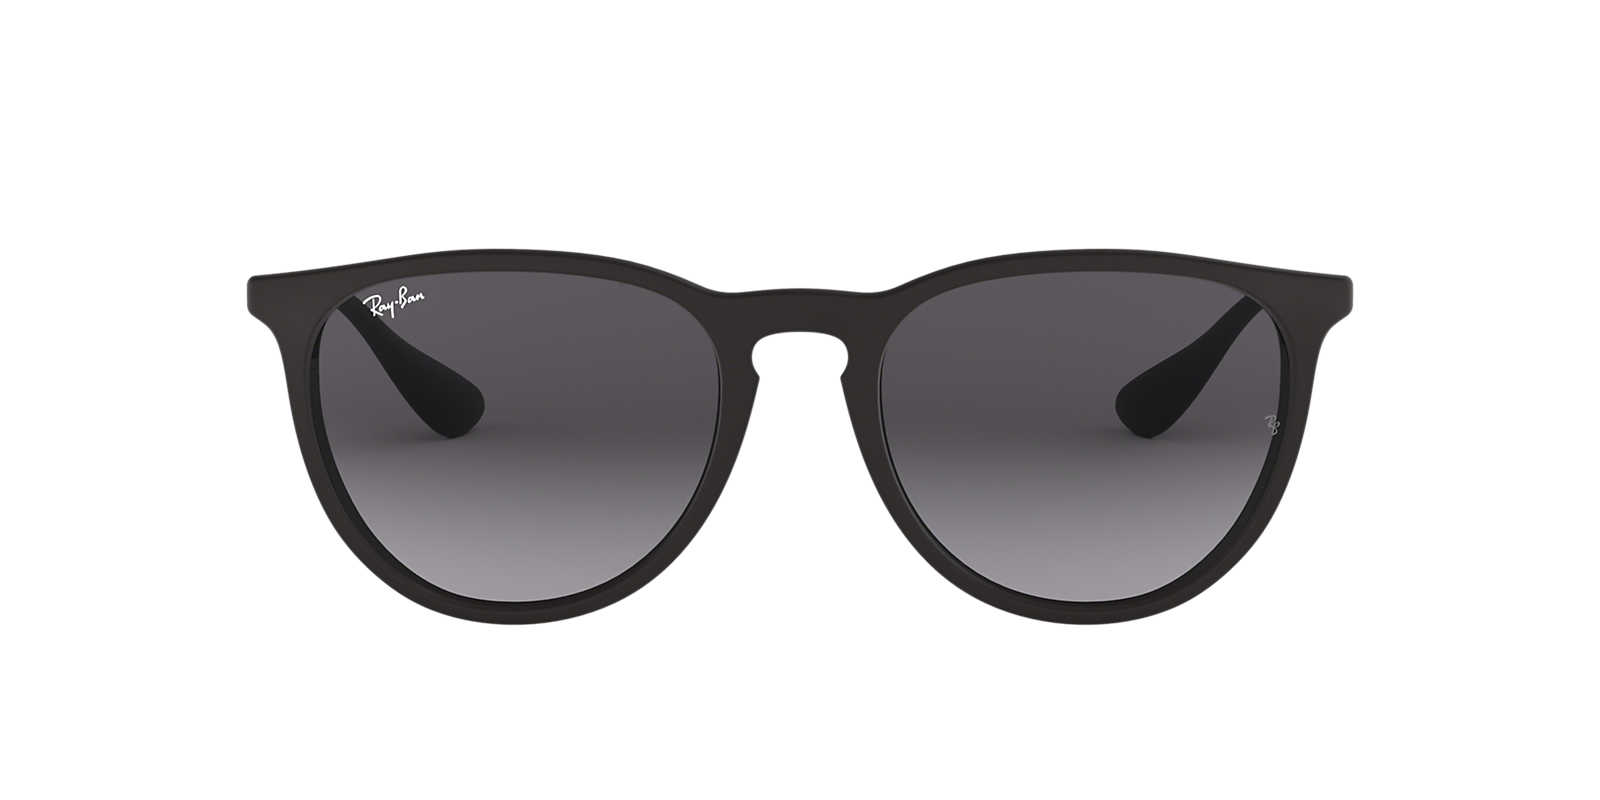 Ray ban sunglasses sale new zealand - Ray Ban Black Rb4171 Grey Lenses 54mm